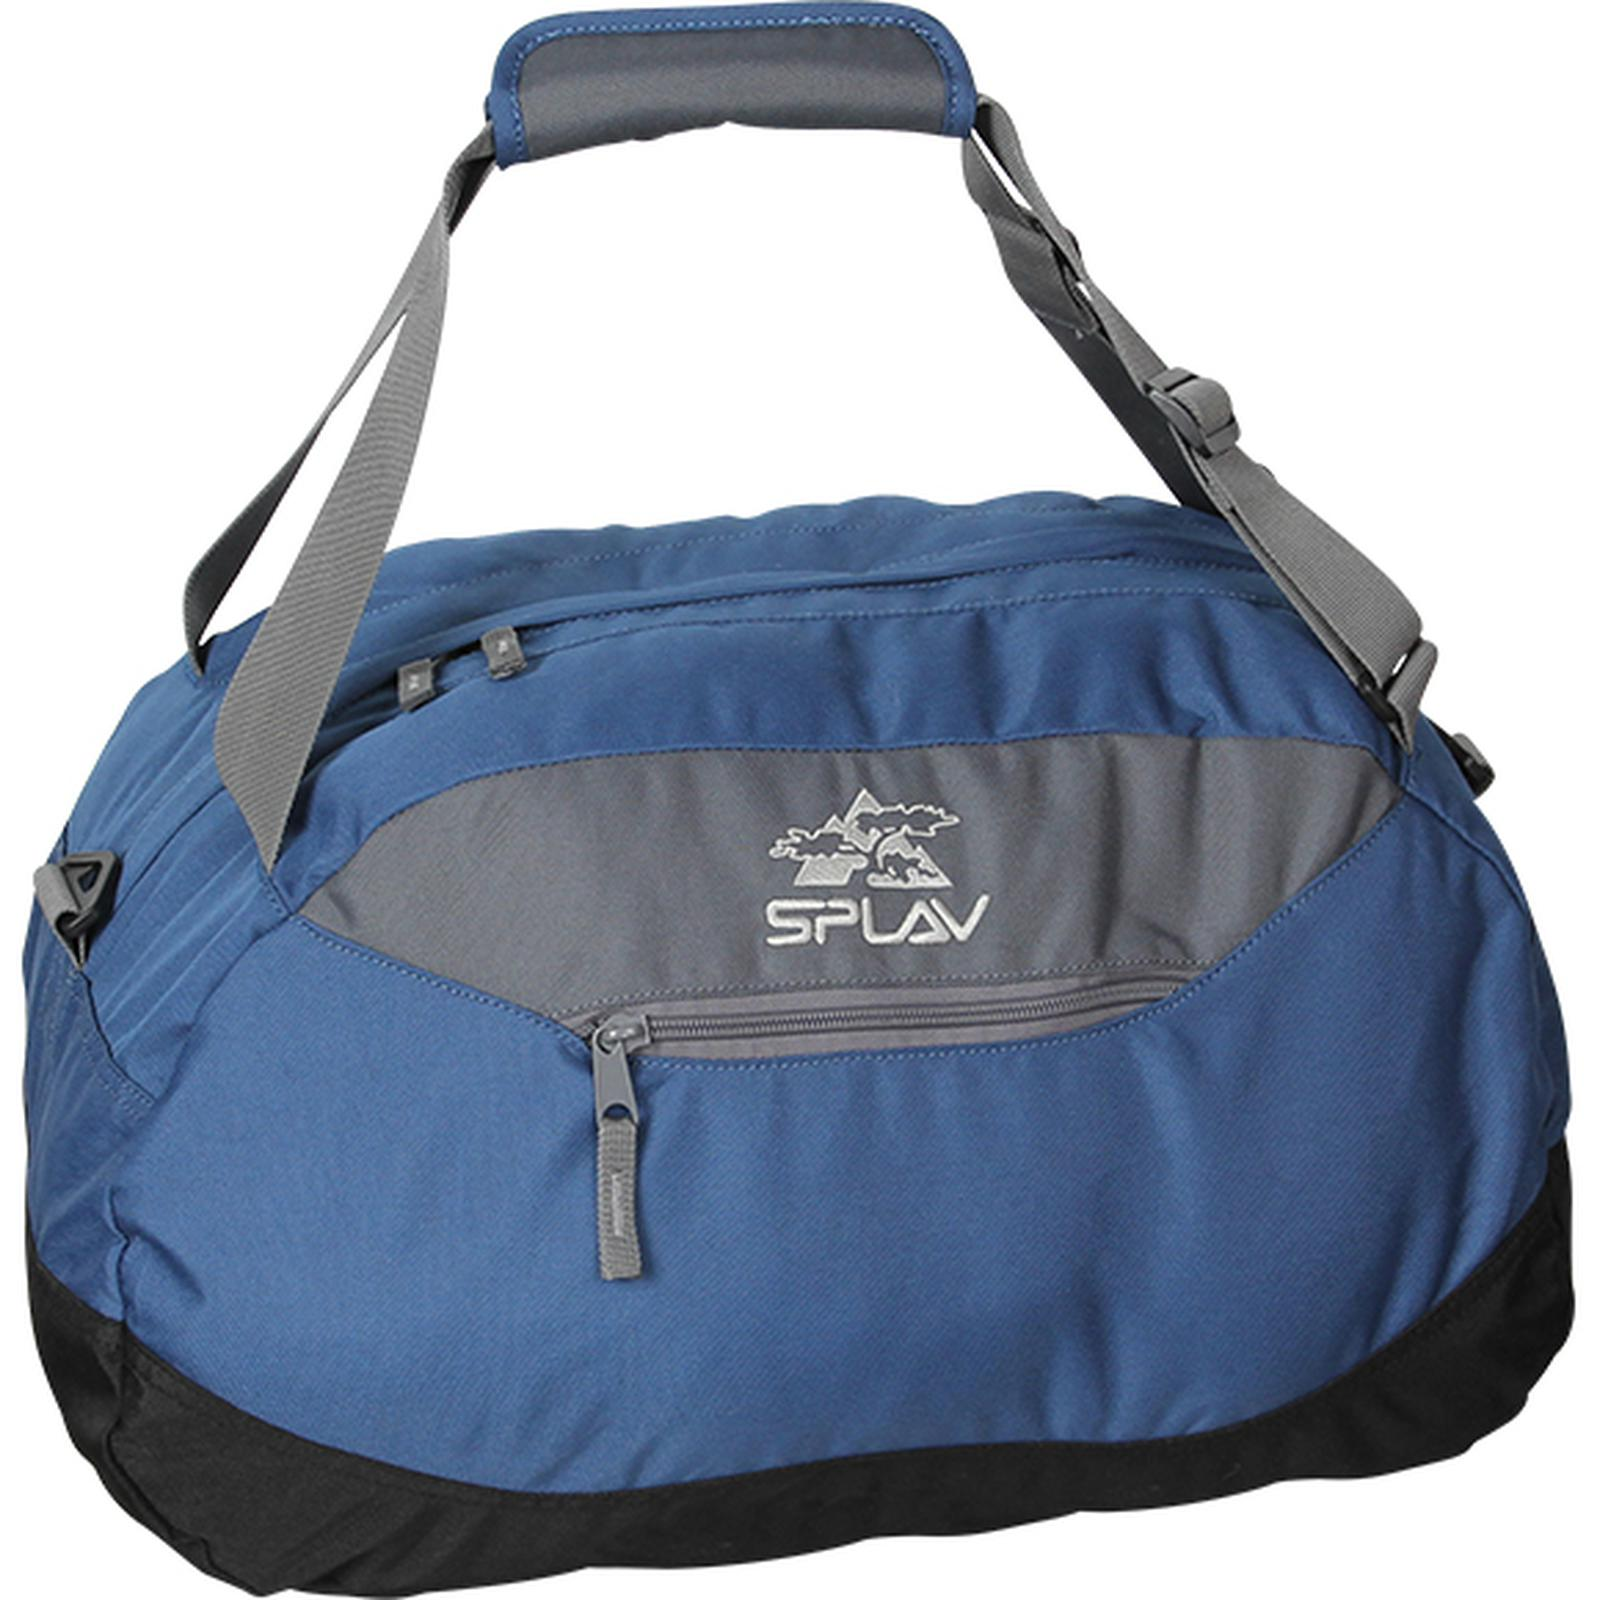 47ee87b2edc8 Спортивная сумка Splav «Paladin» (оливковый). Скидка 77 руб.